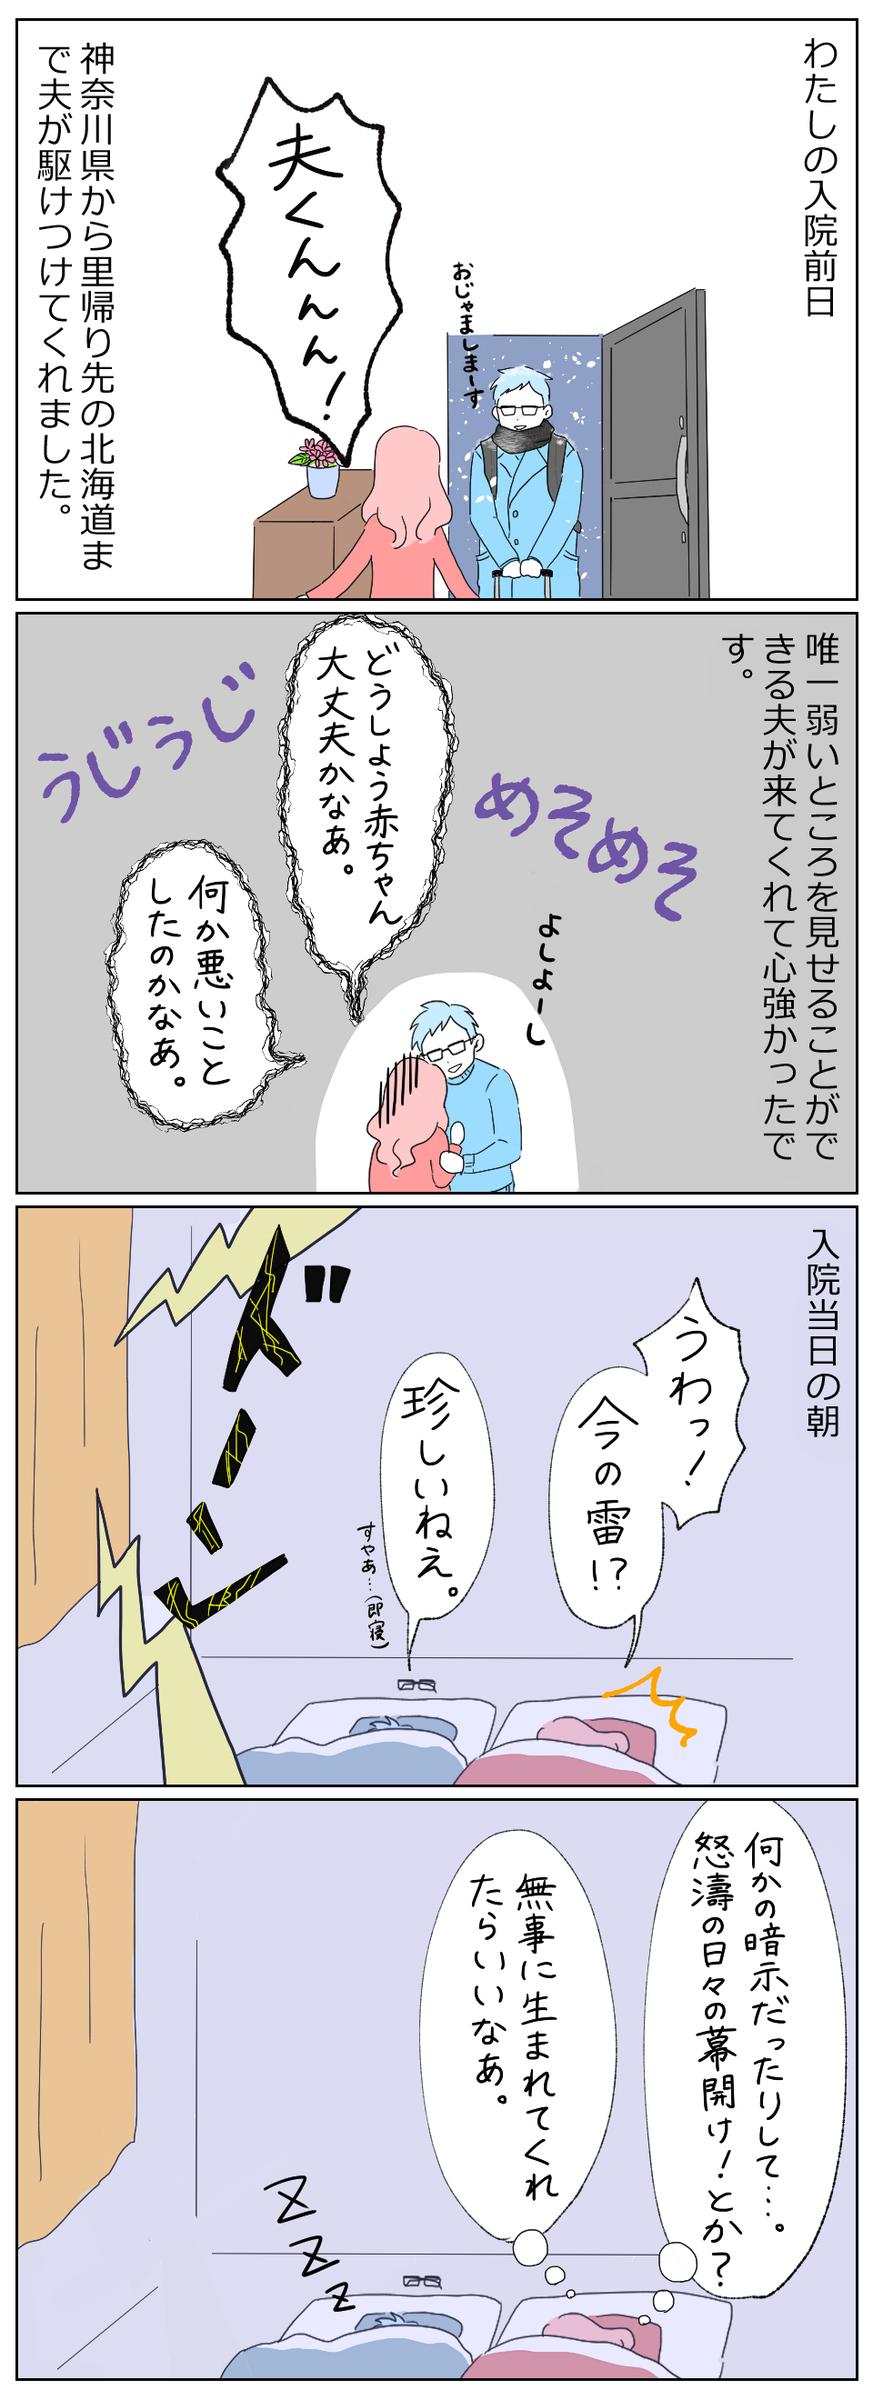 f:id:kayarimo:20190321133207j:plain